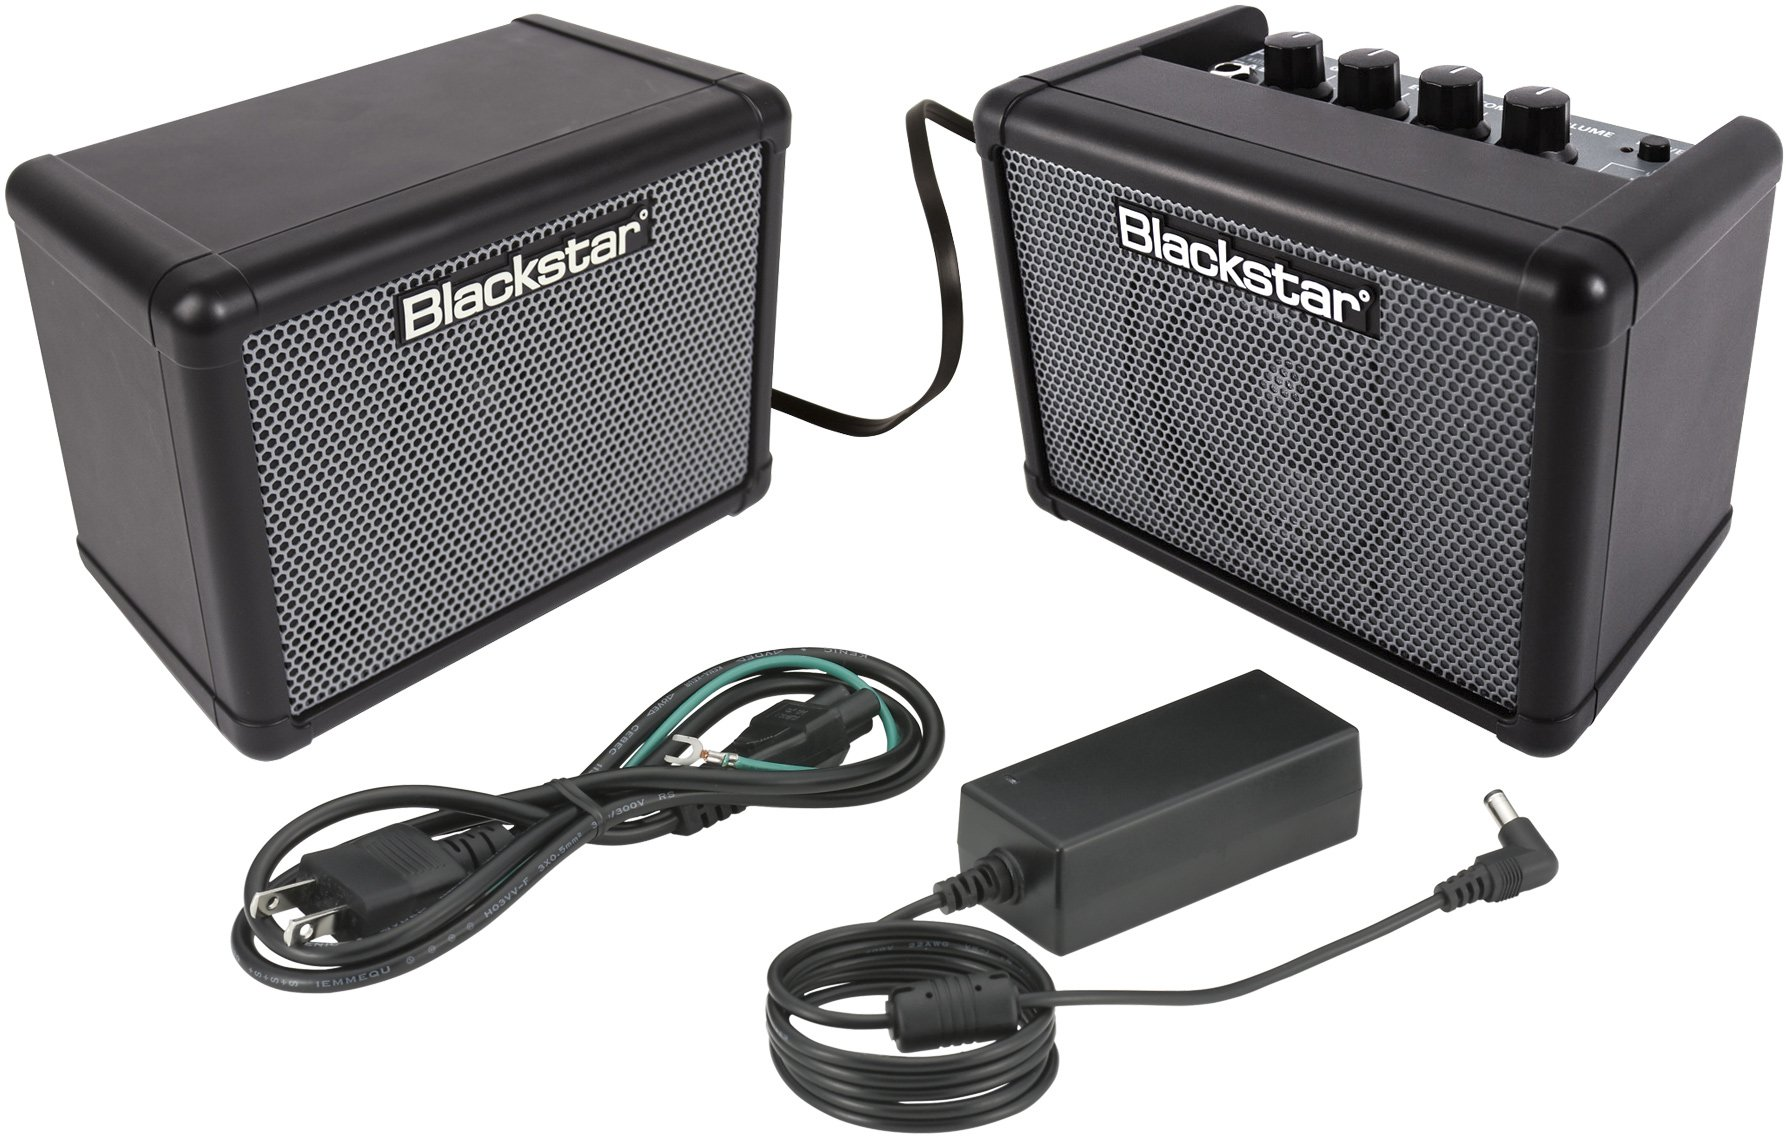 Blackstar FLY3BASSPAK Stereo Pack Electric Guitar by Blackstar